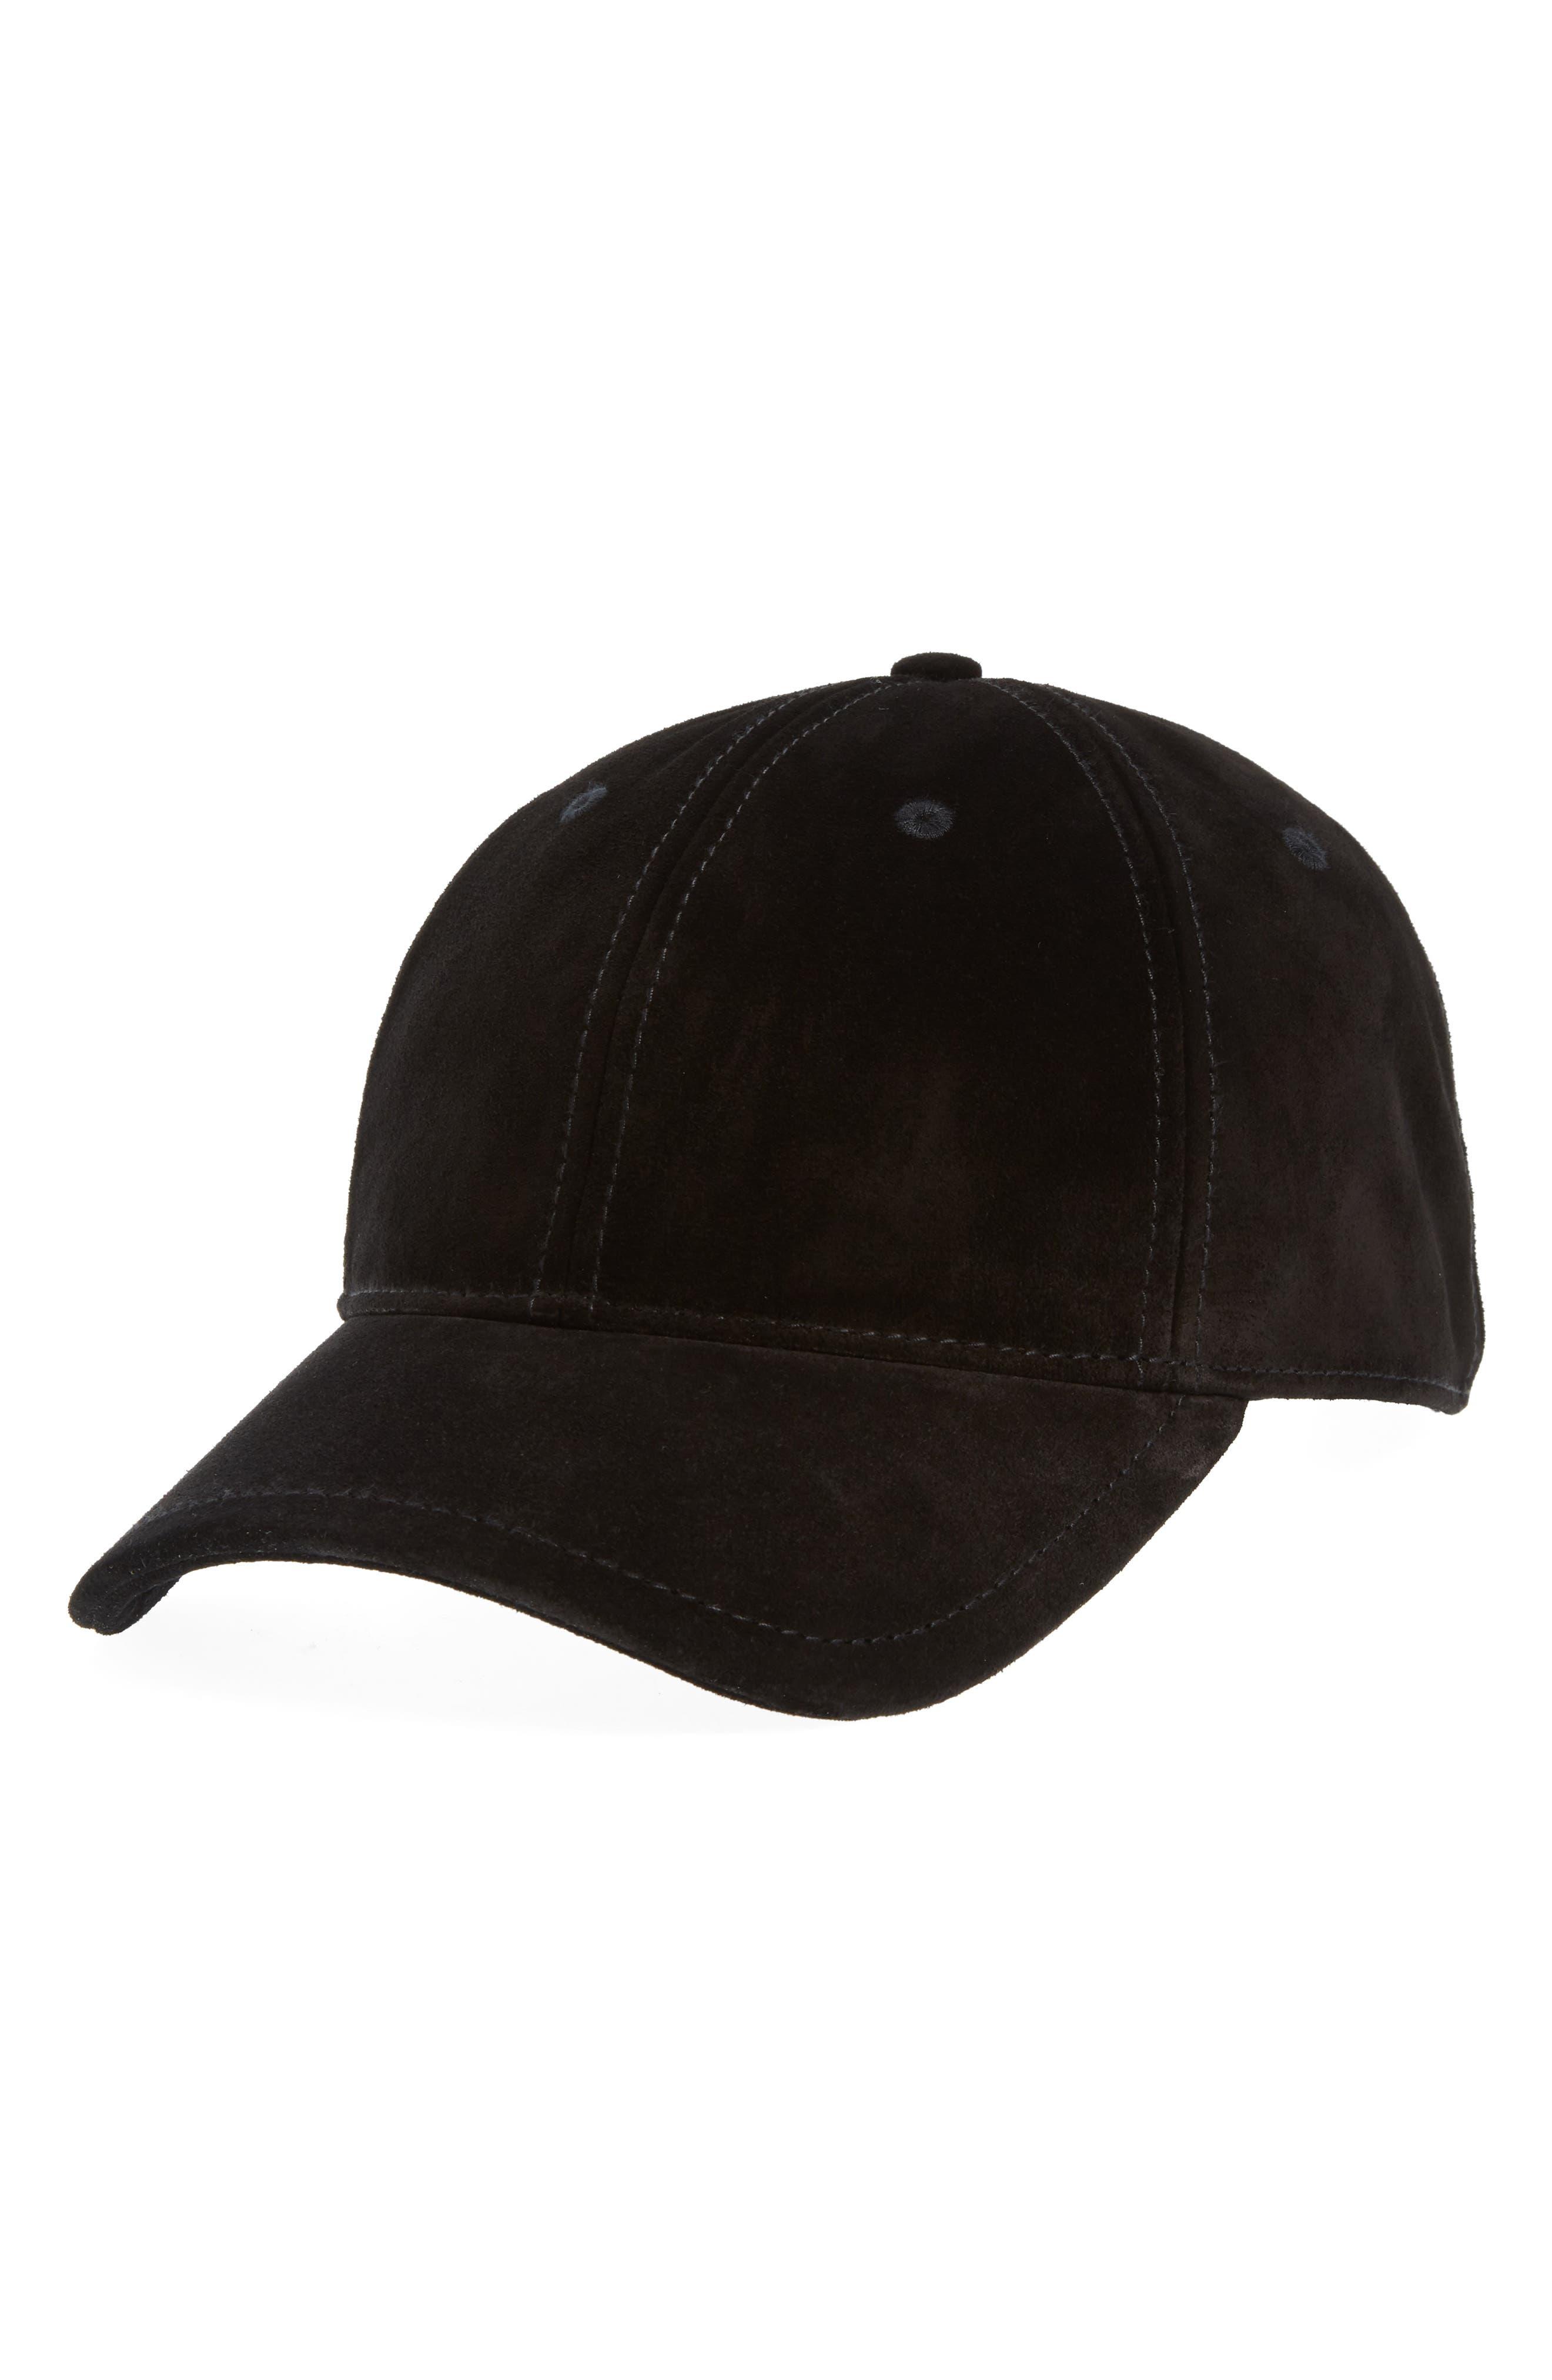 Lenox Ball Cap,                             Main thumbnail 1, color,                             Black Suede